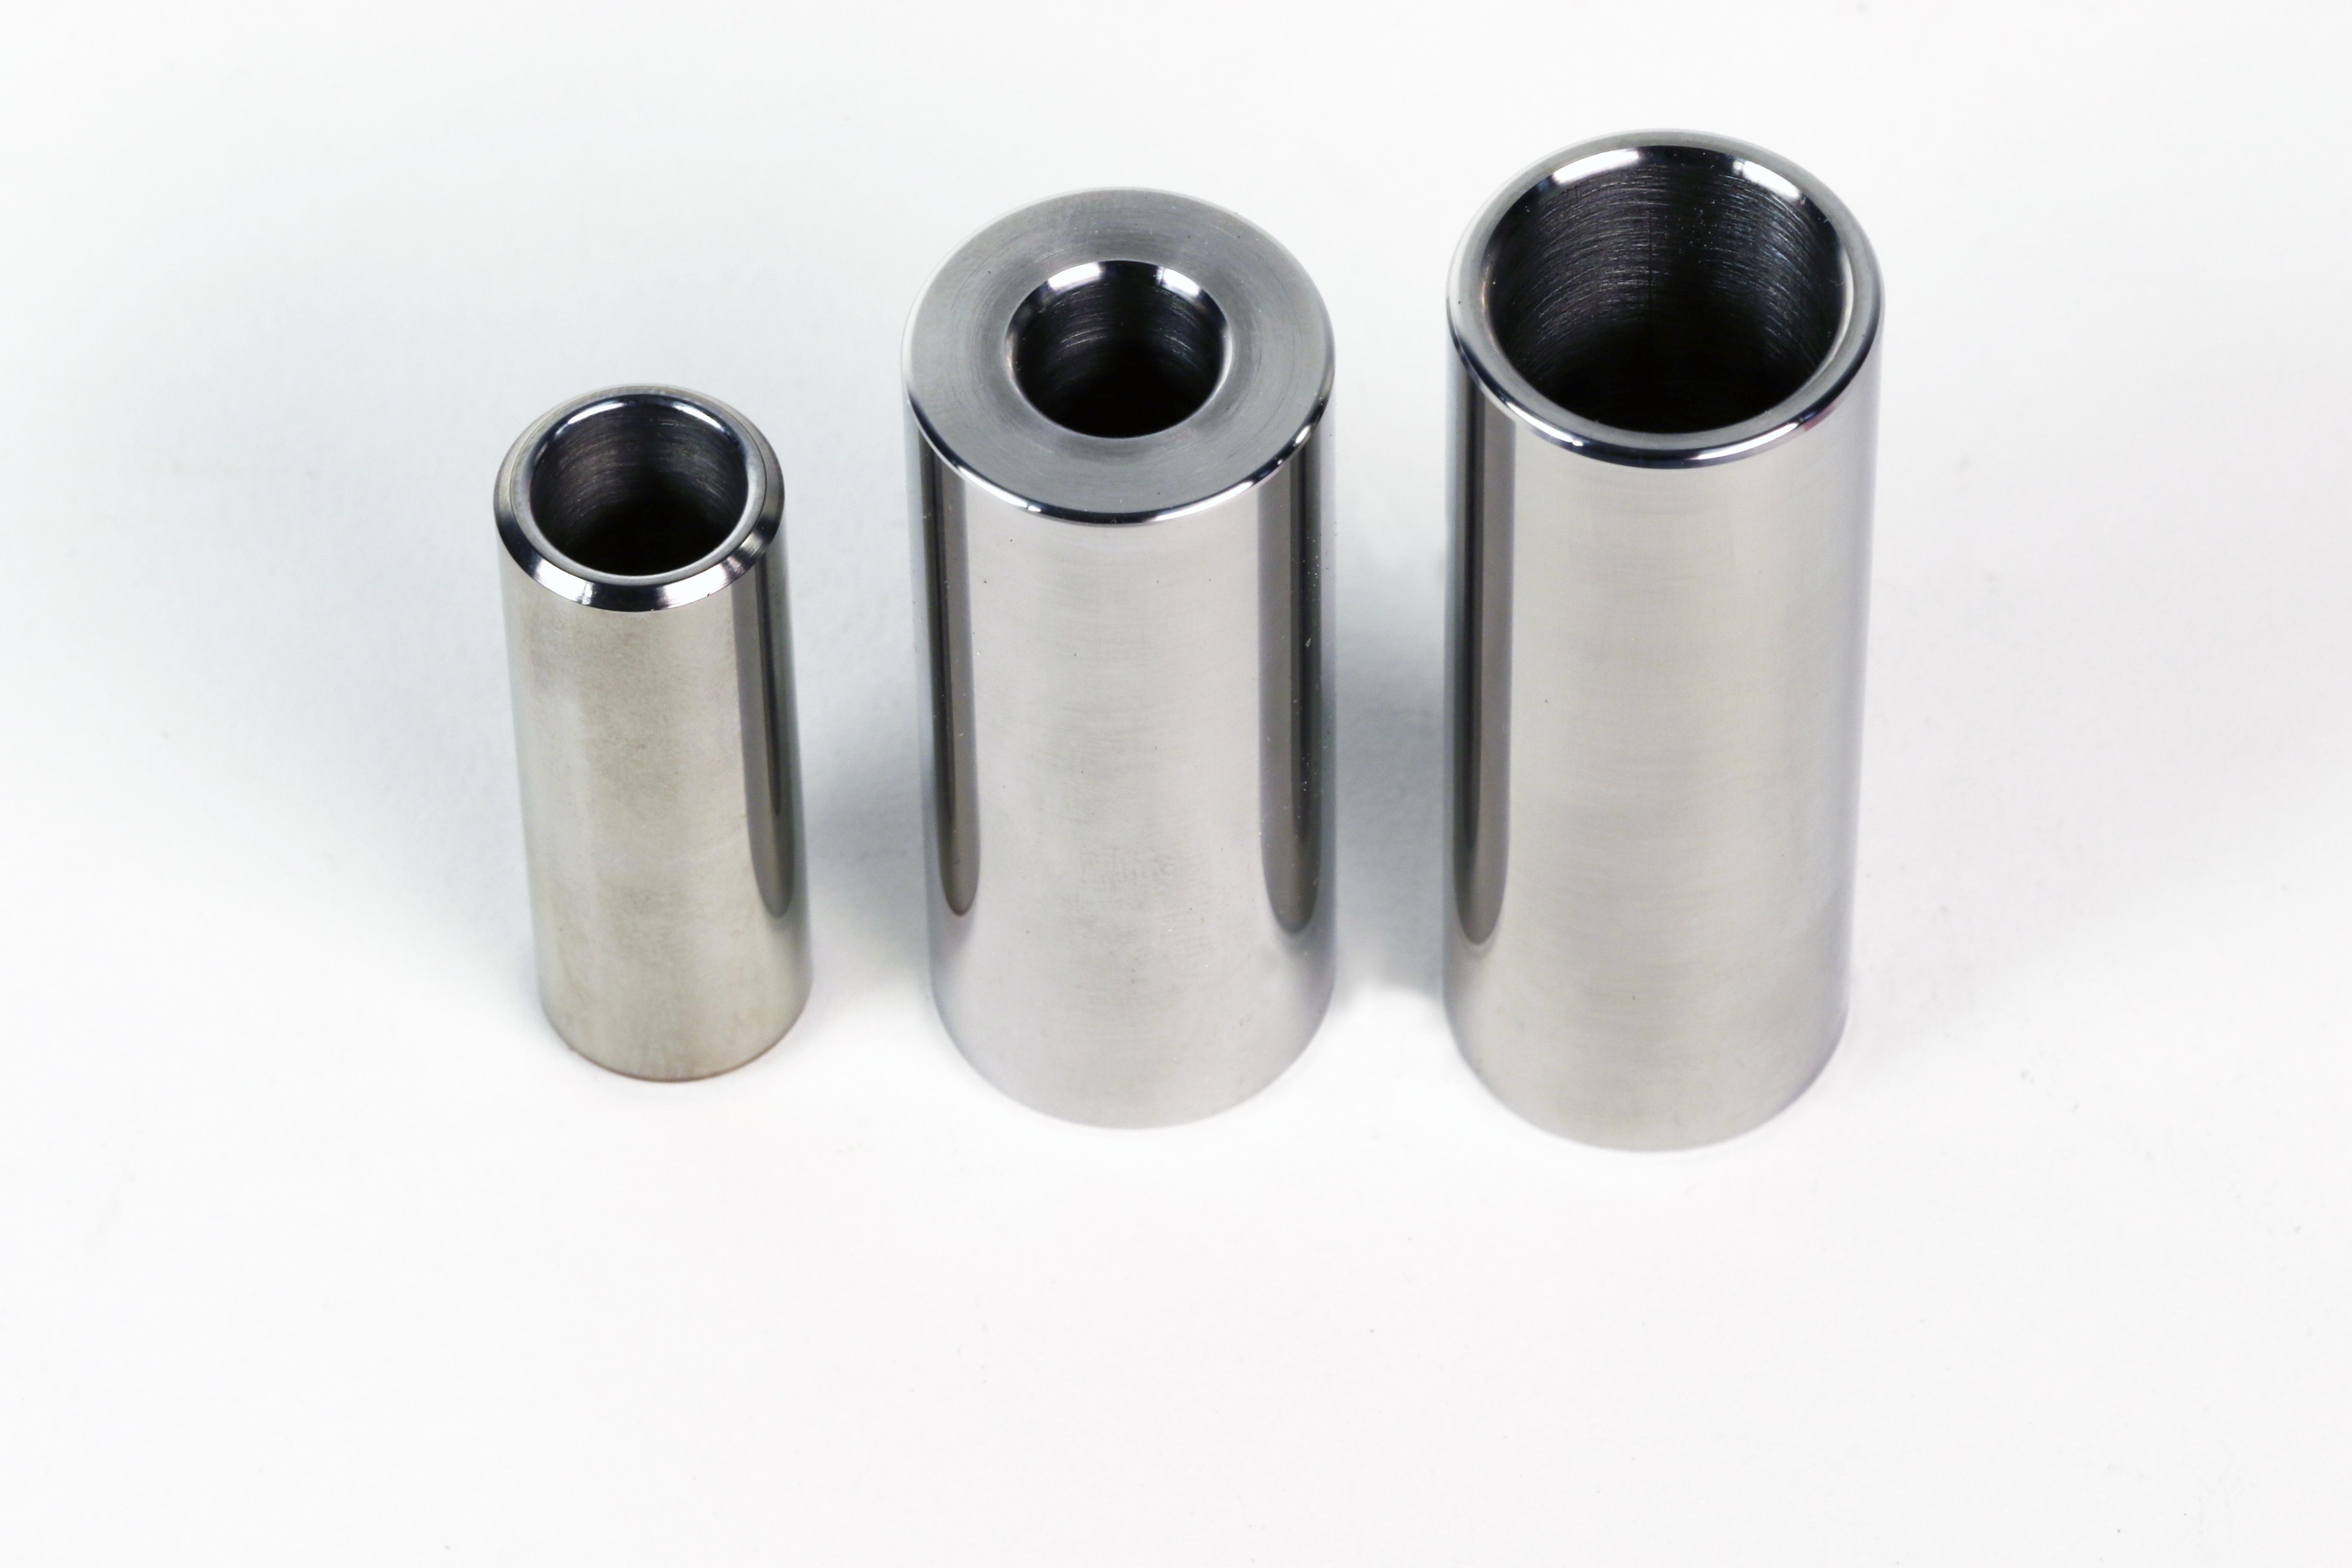 003-trend-wrist-pins-DLC-coated.jpgE?t=1475023575990&width=349&name=piston2.jpg